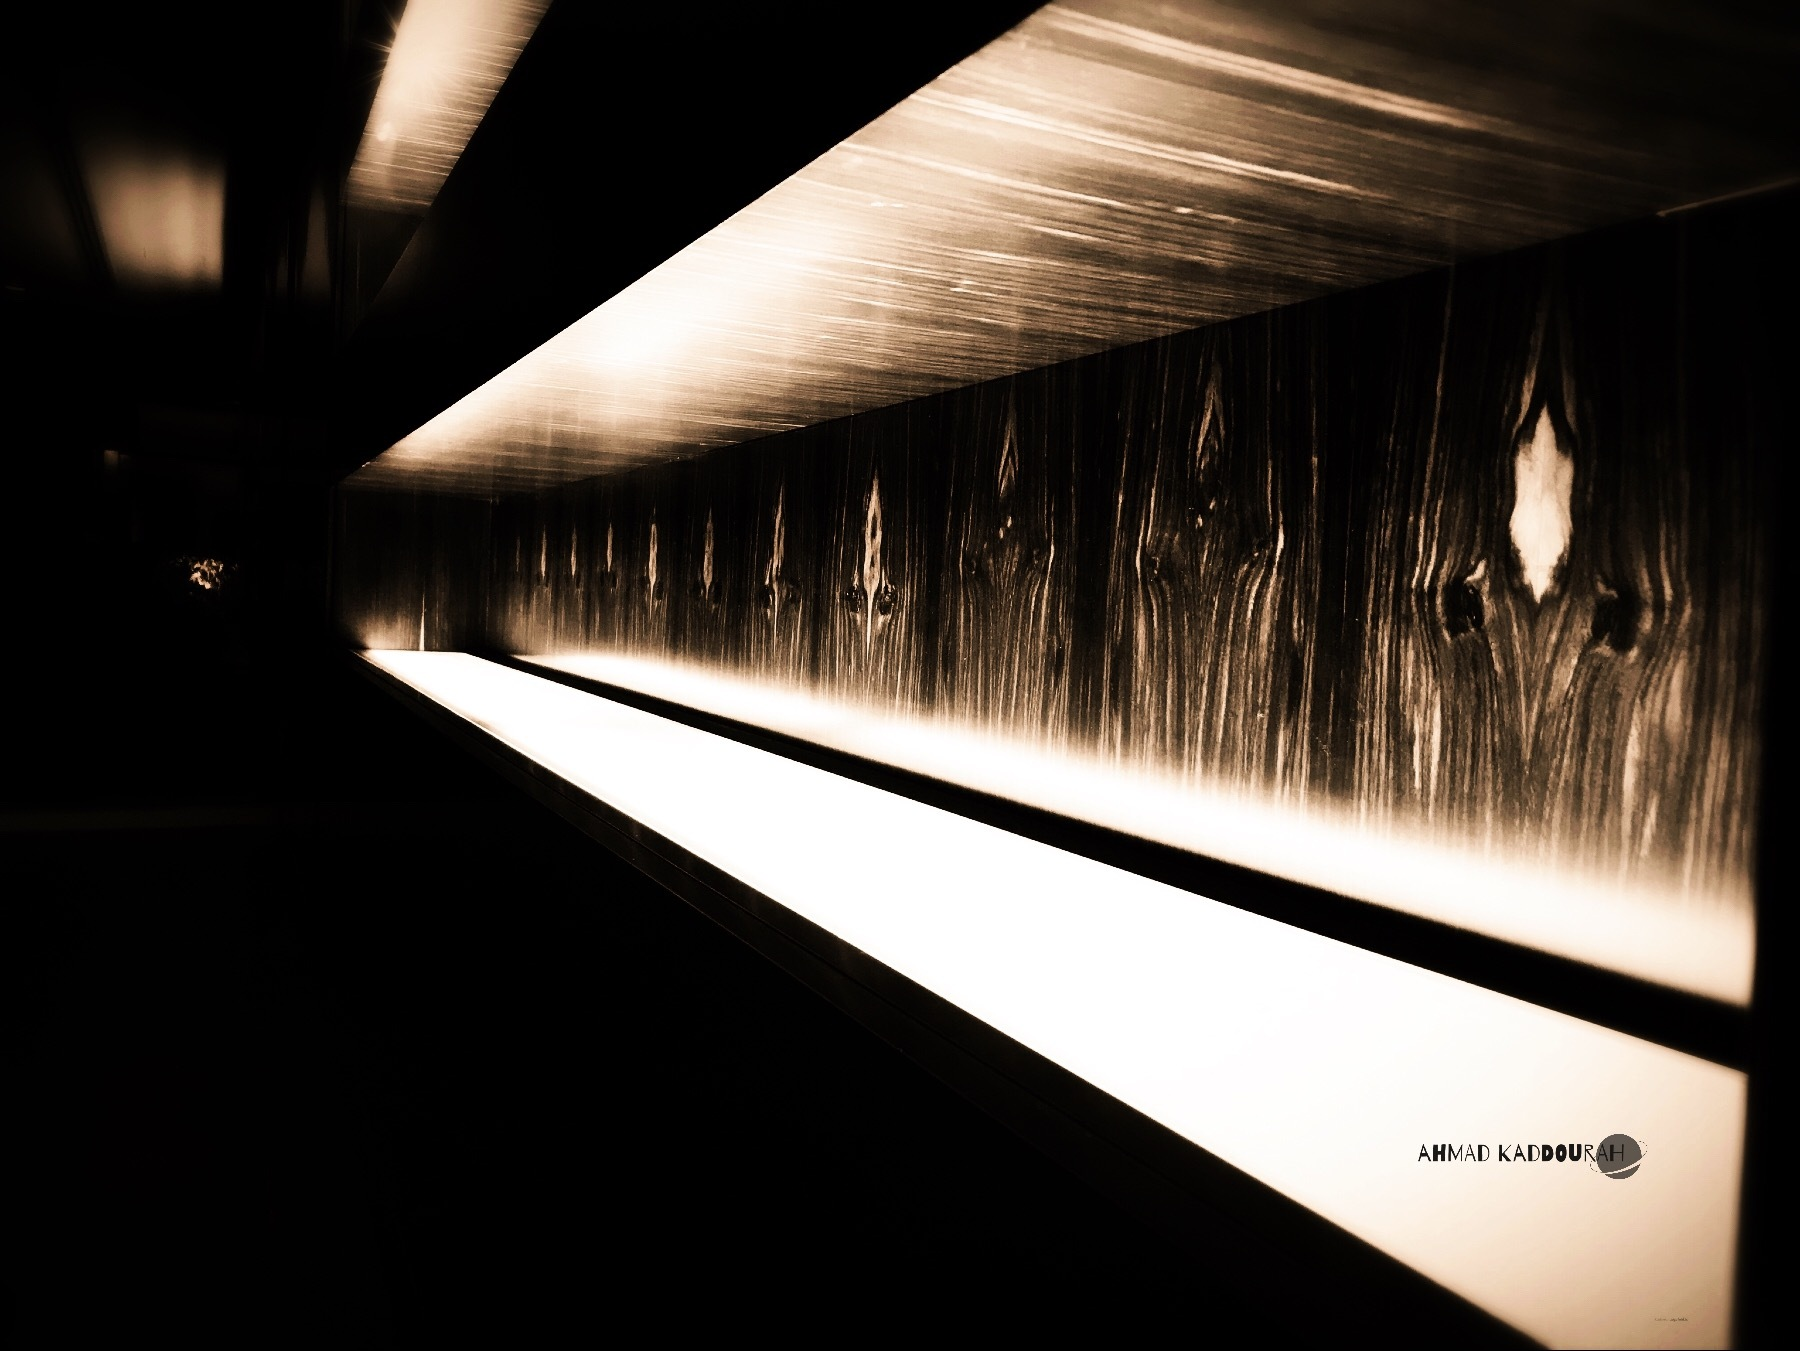 Untitled by AhmadKaddourah